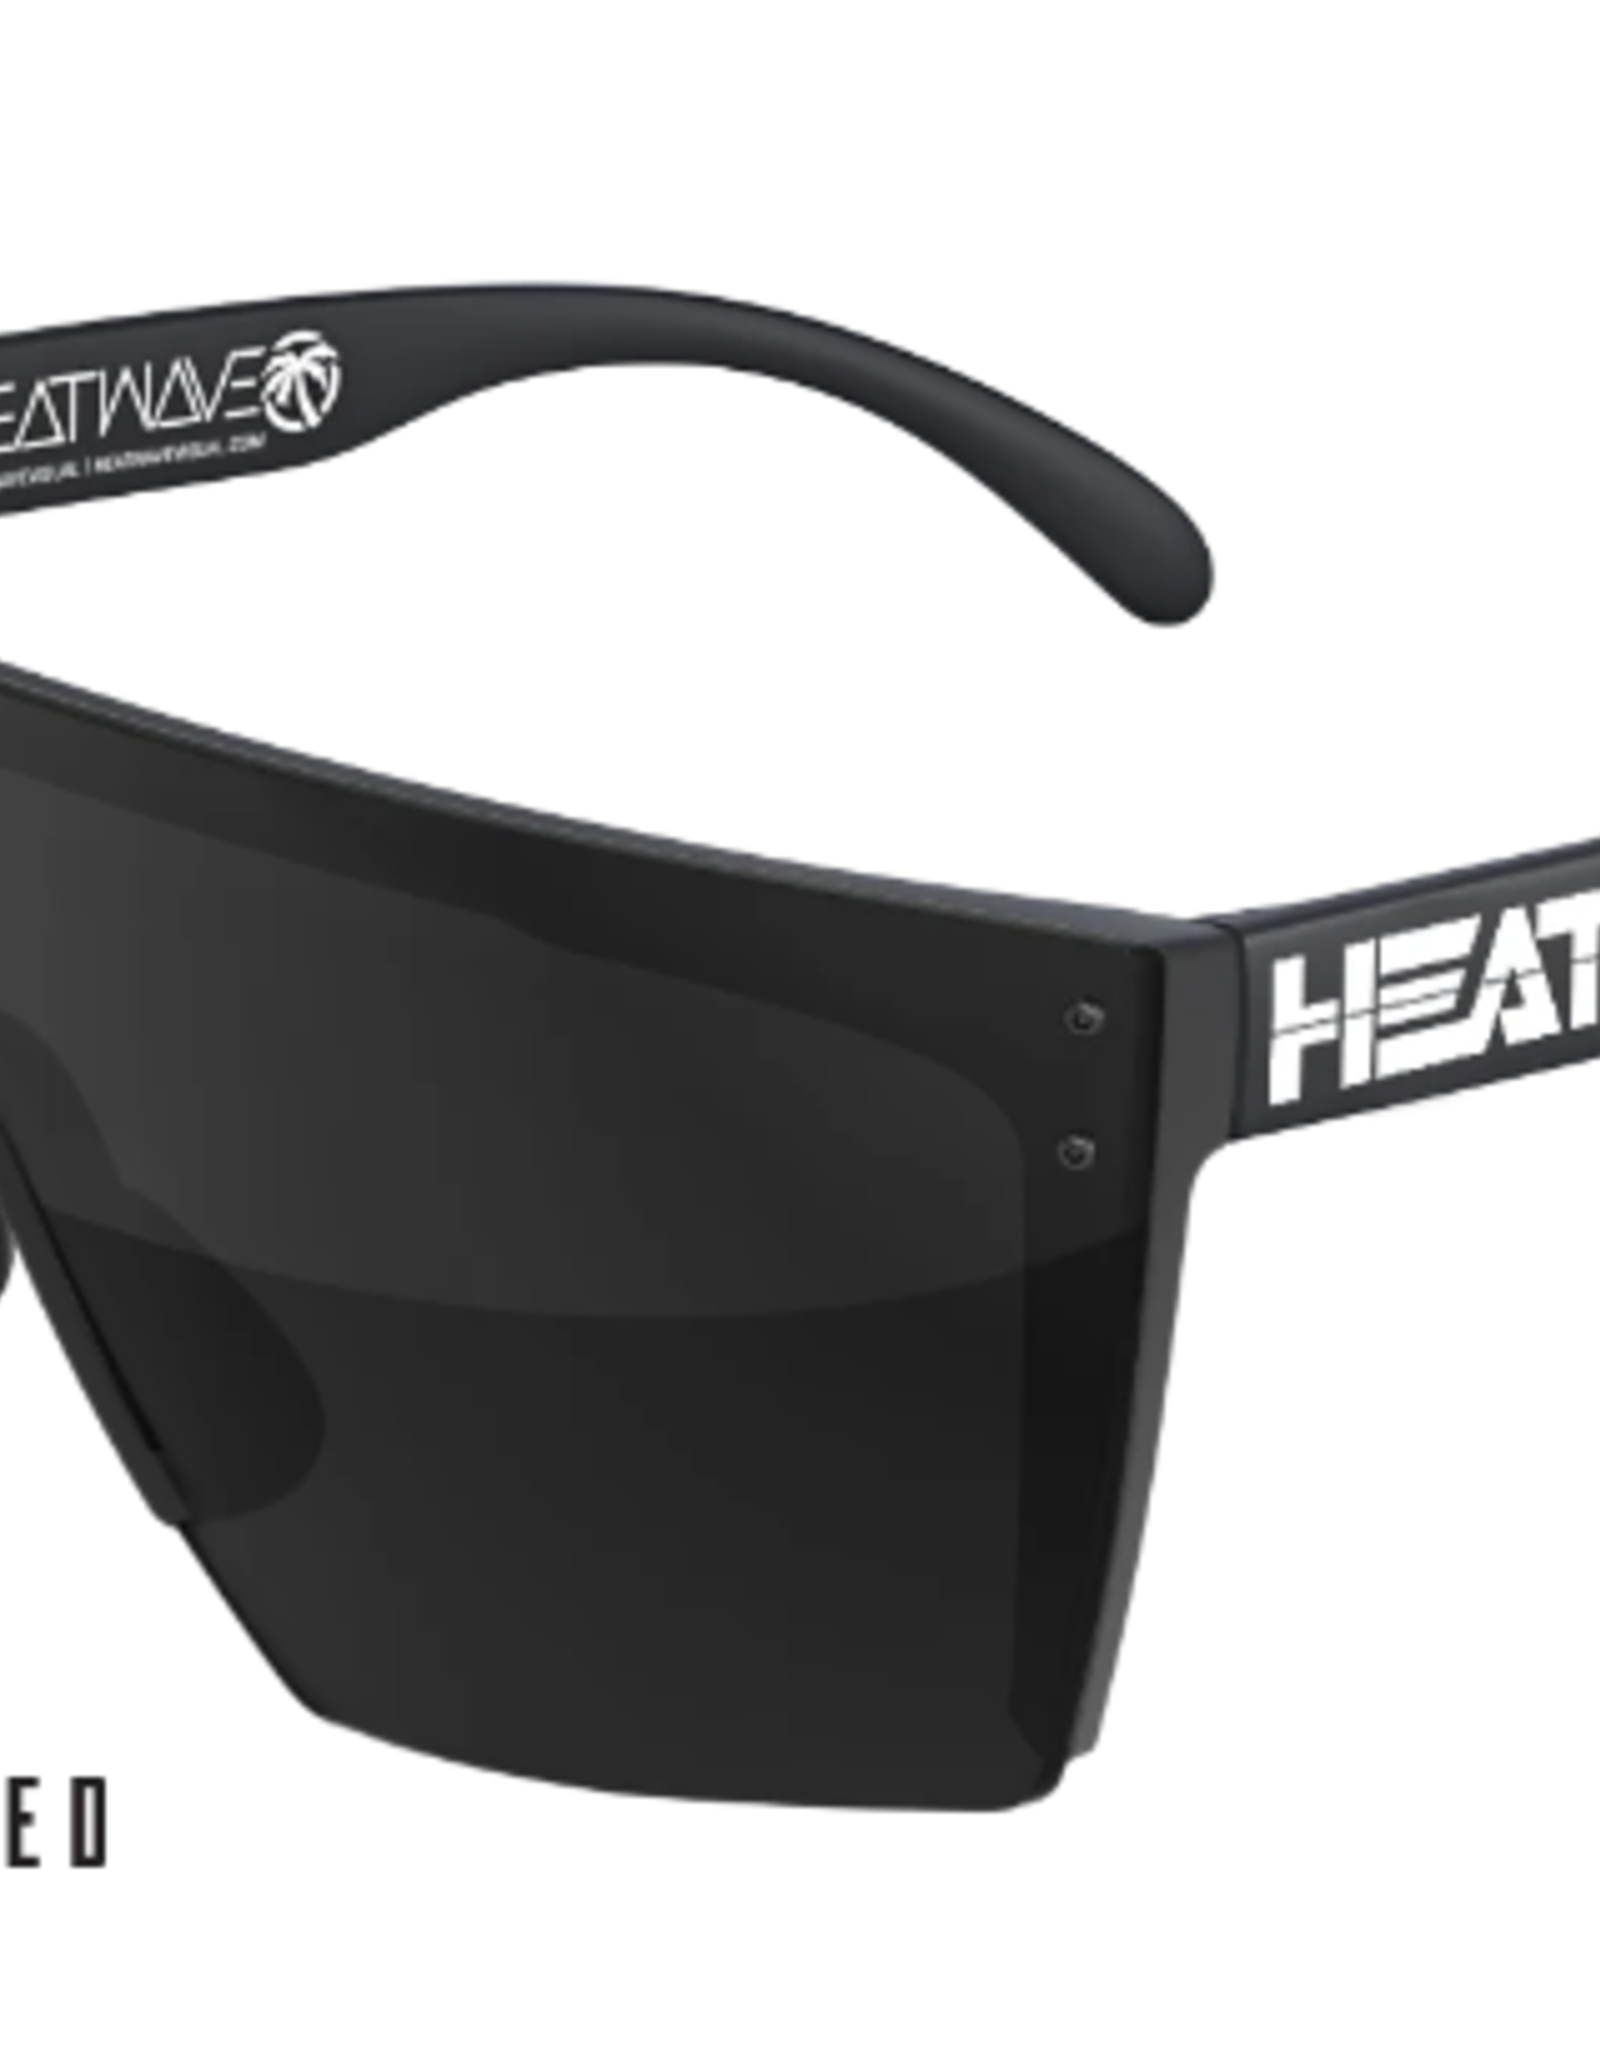 Heatwave Visual Heatwave - LAZER FACE (Z87) - POLAR Black Billboard